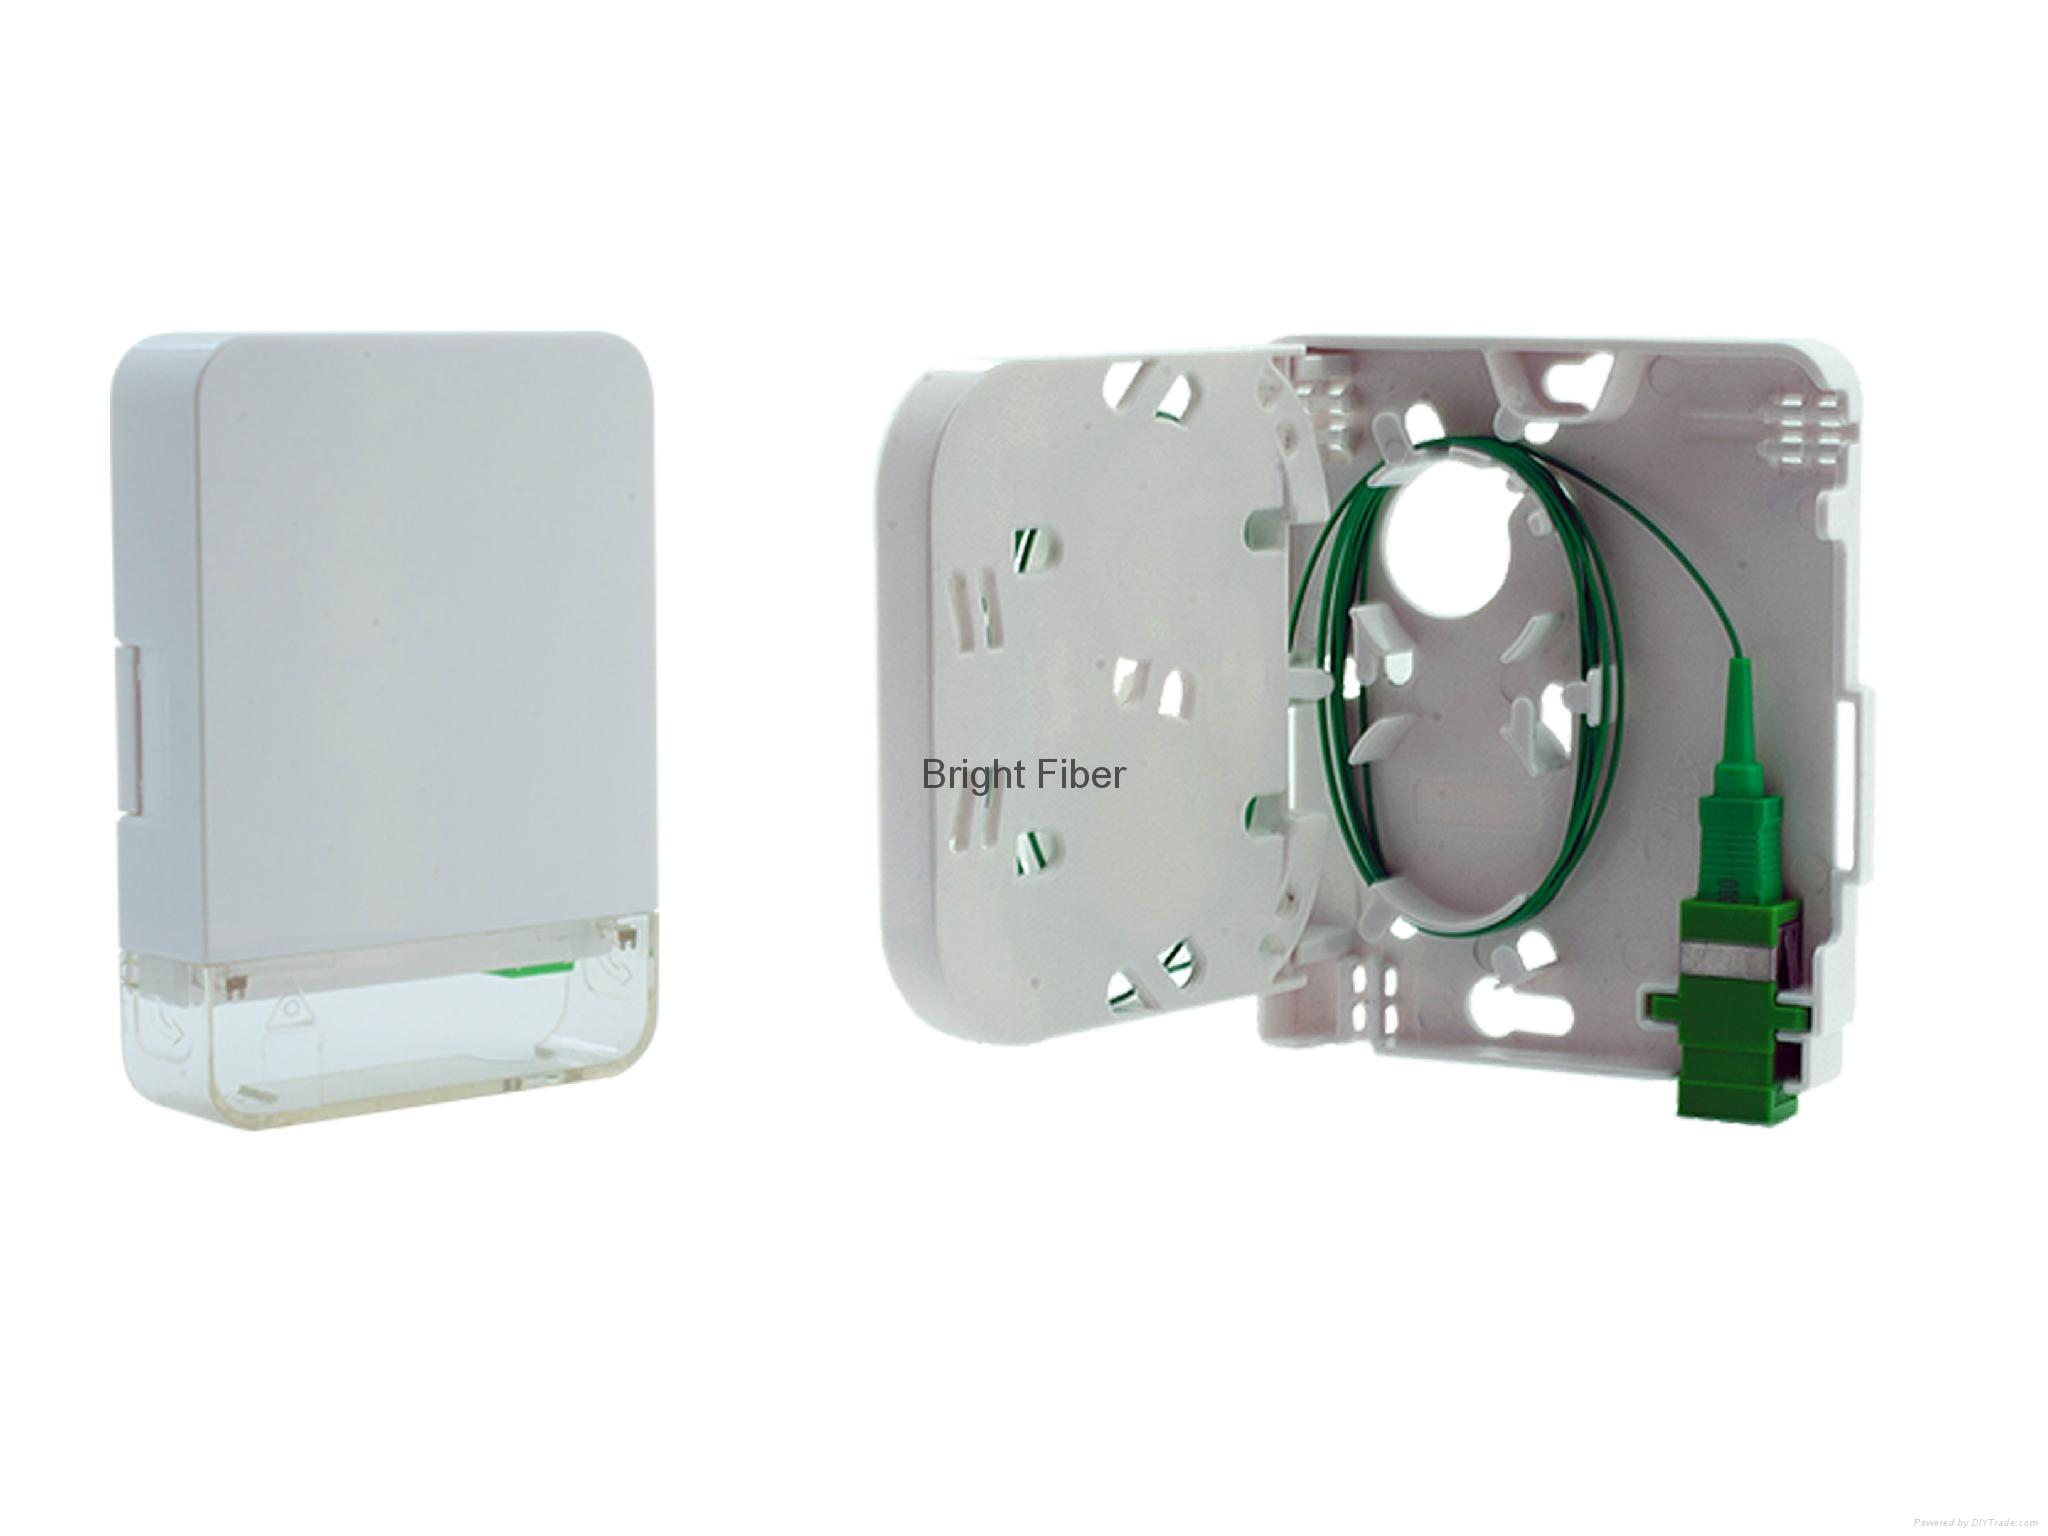 diy home fiber optic network